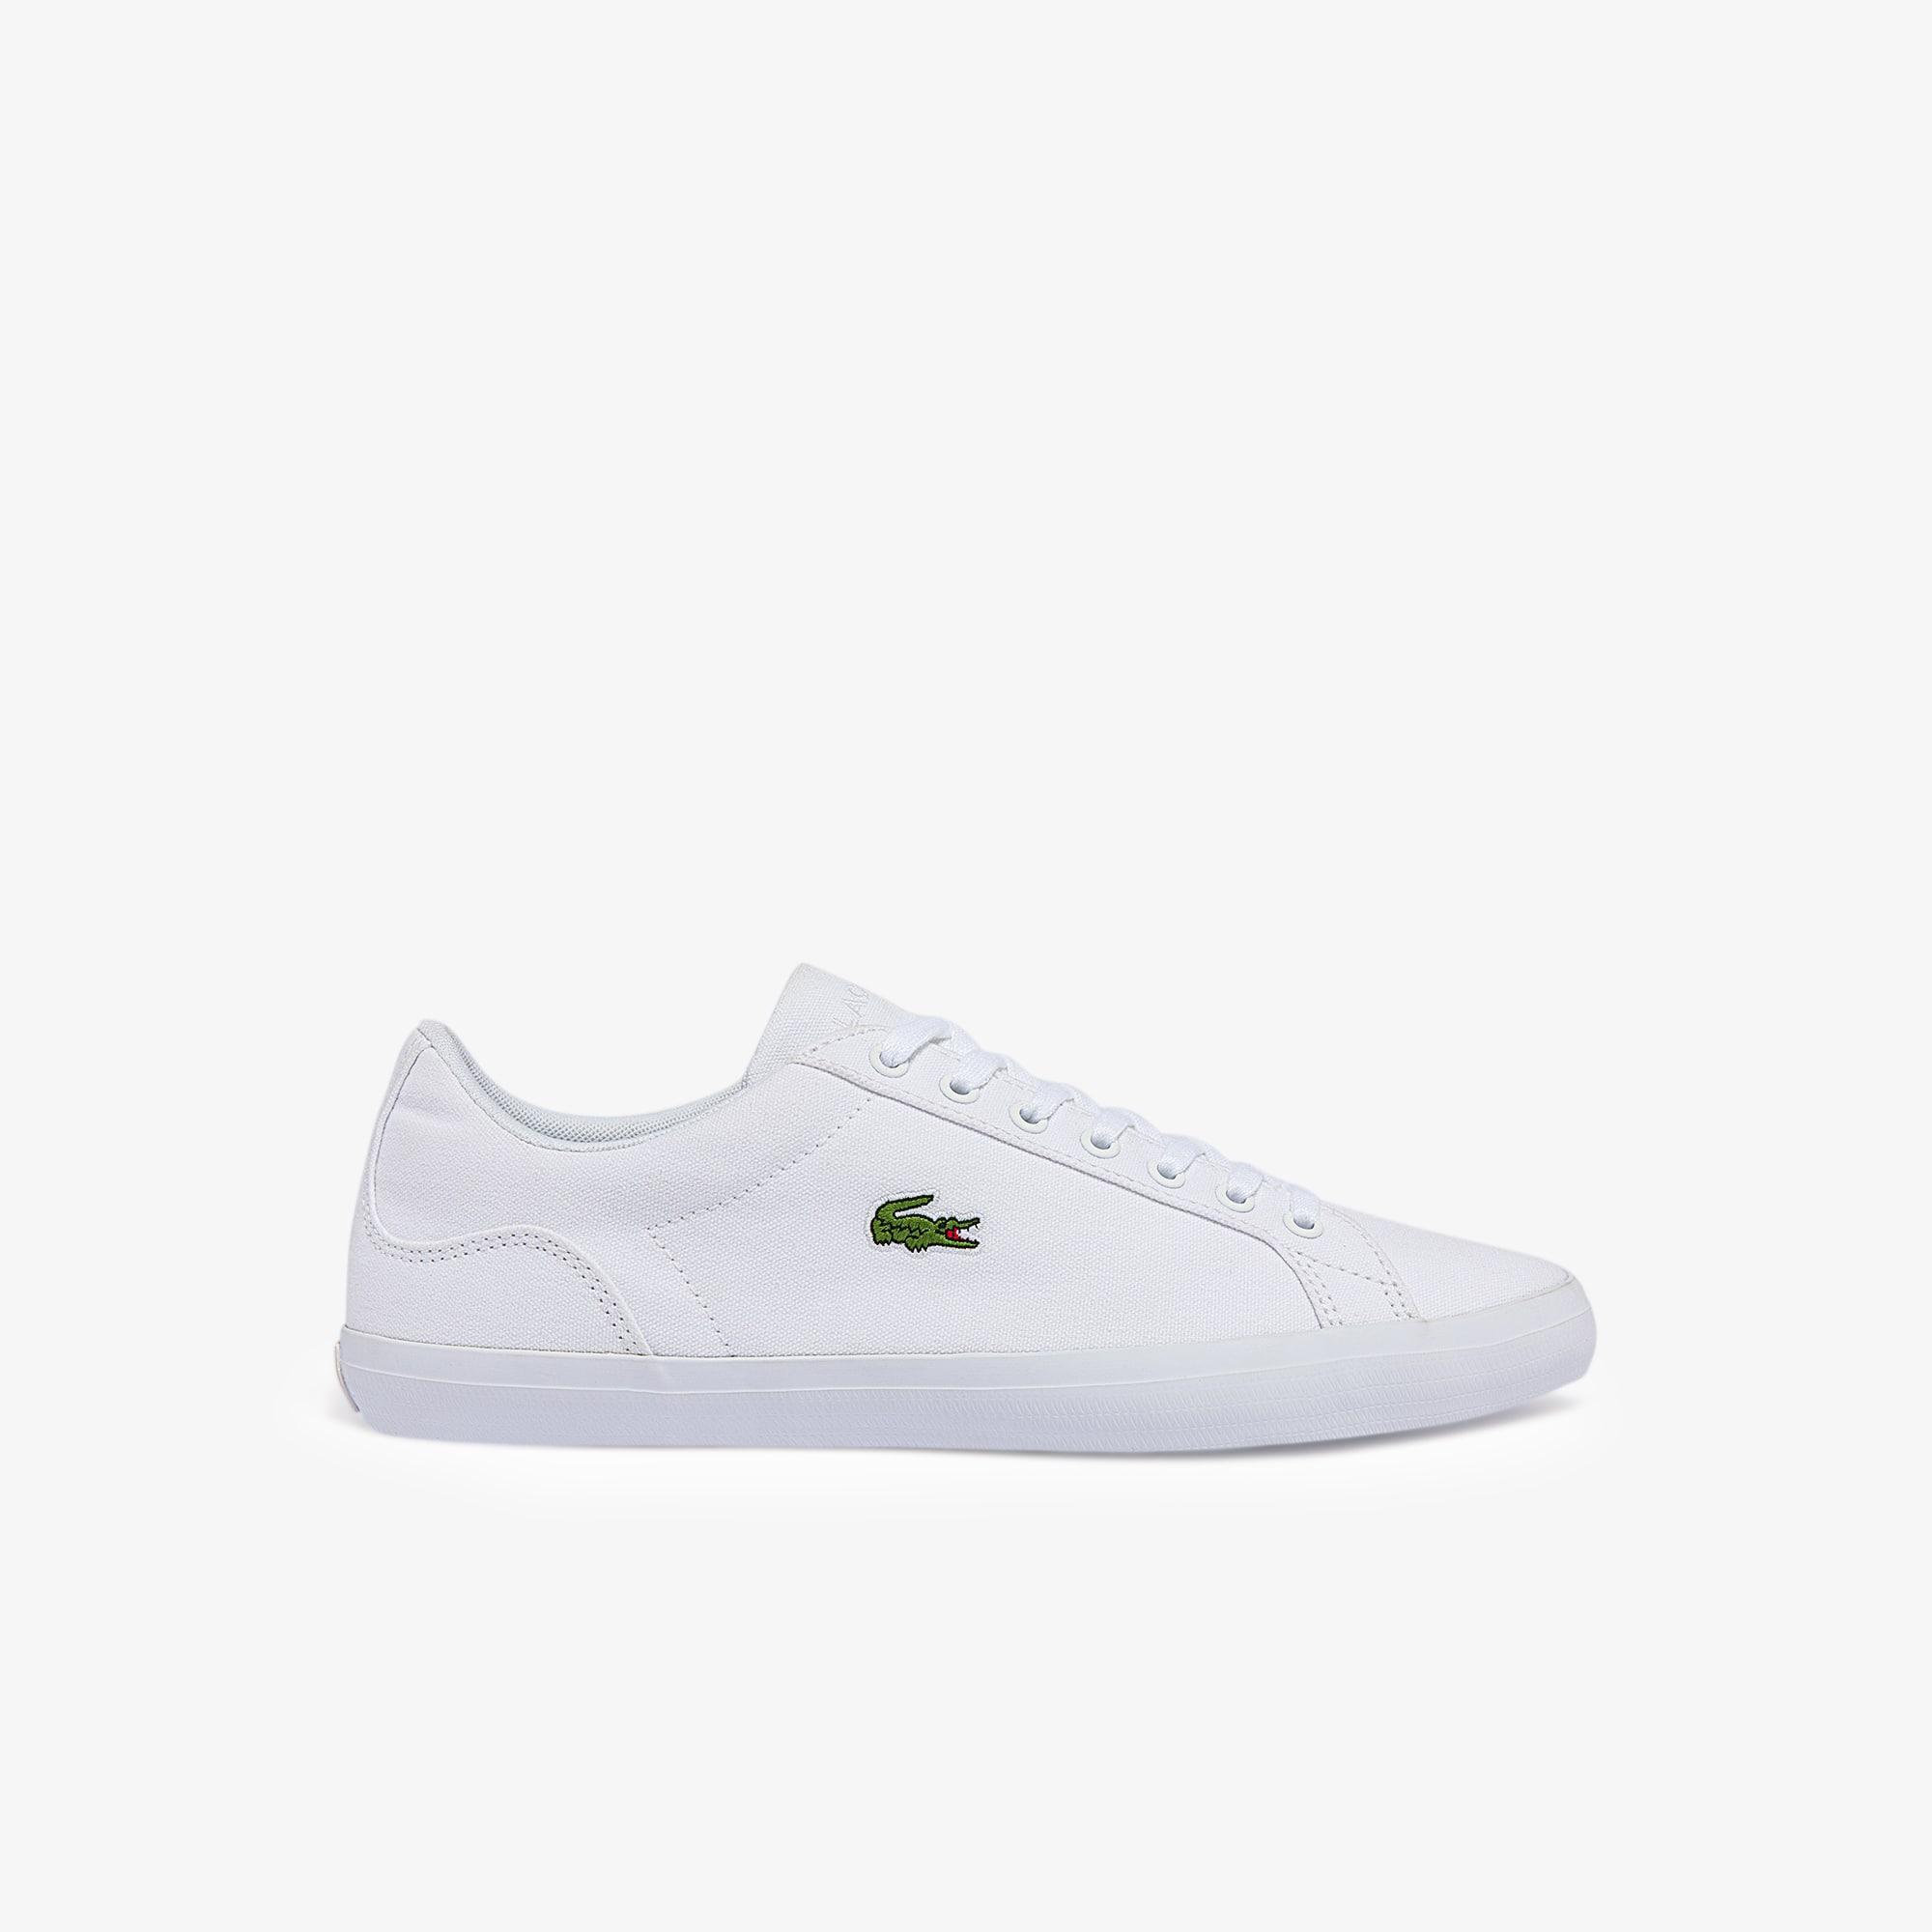 Chaussures Et Sneakers HommeLacoste HommeBaskets thrBoQdxsC